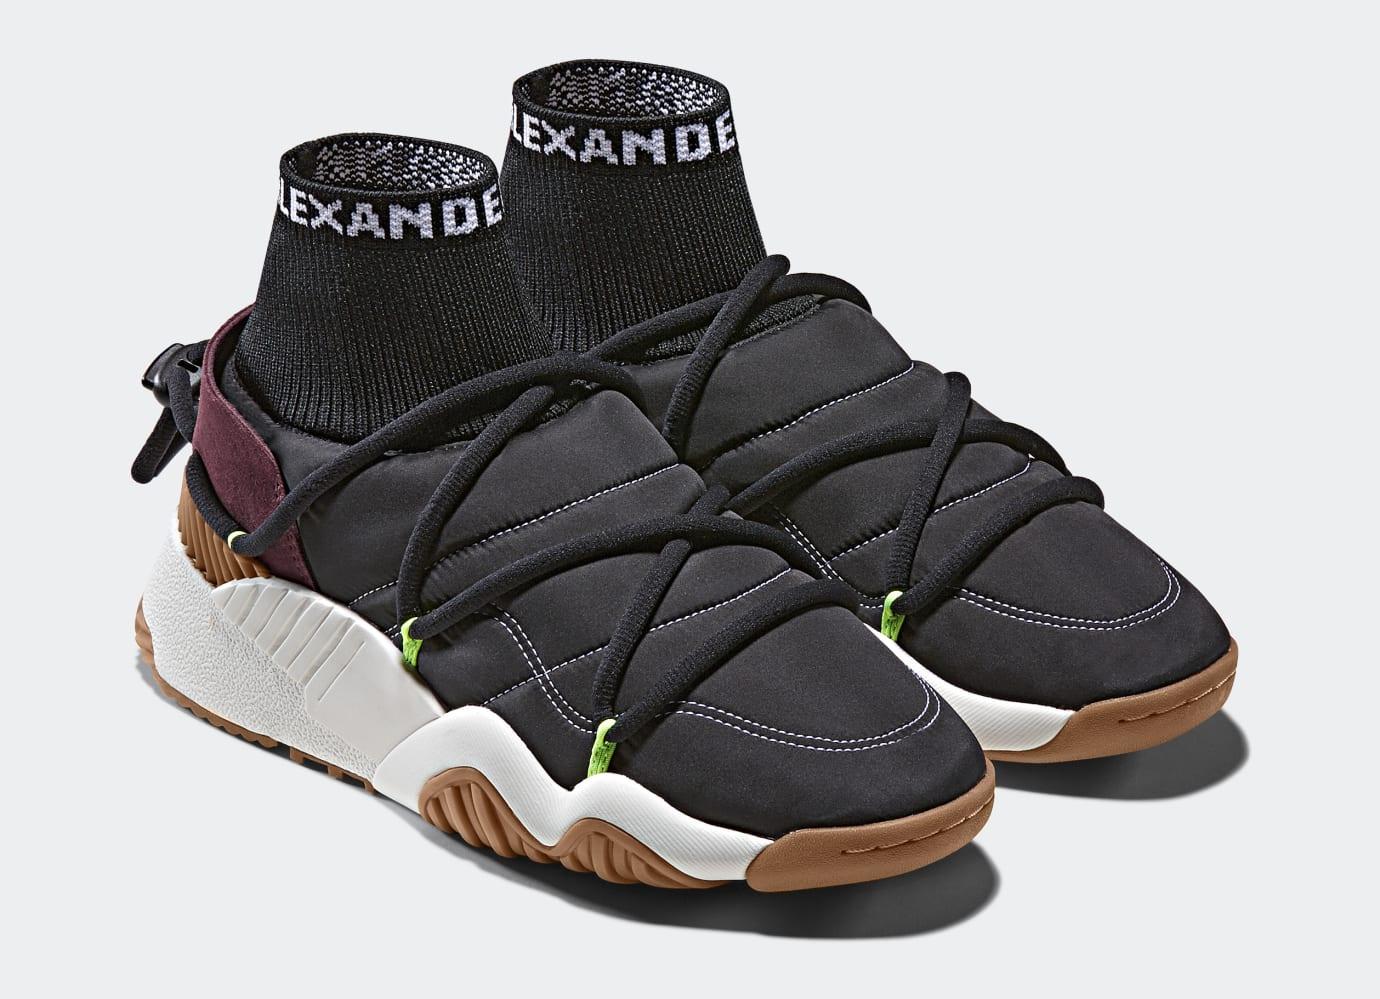 Alexander Wang x Adidas AW Puff Trainer (Pair)